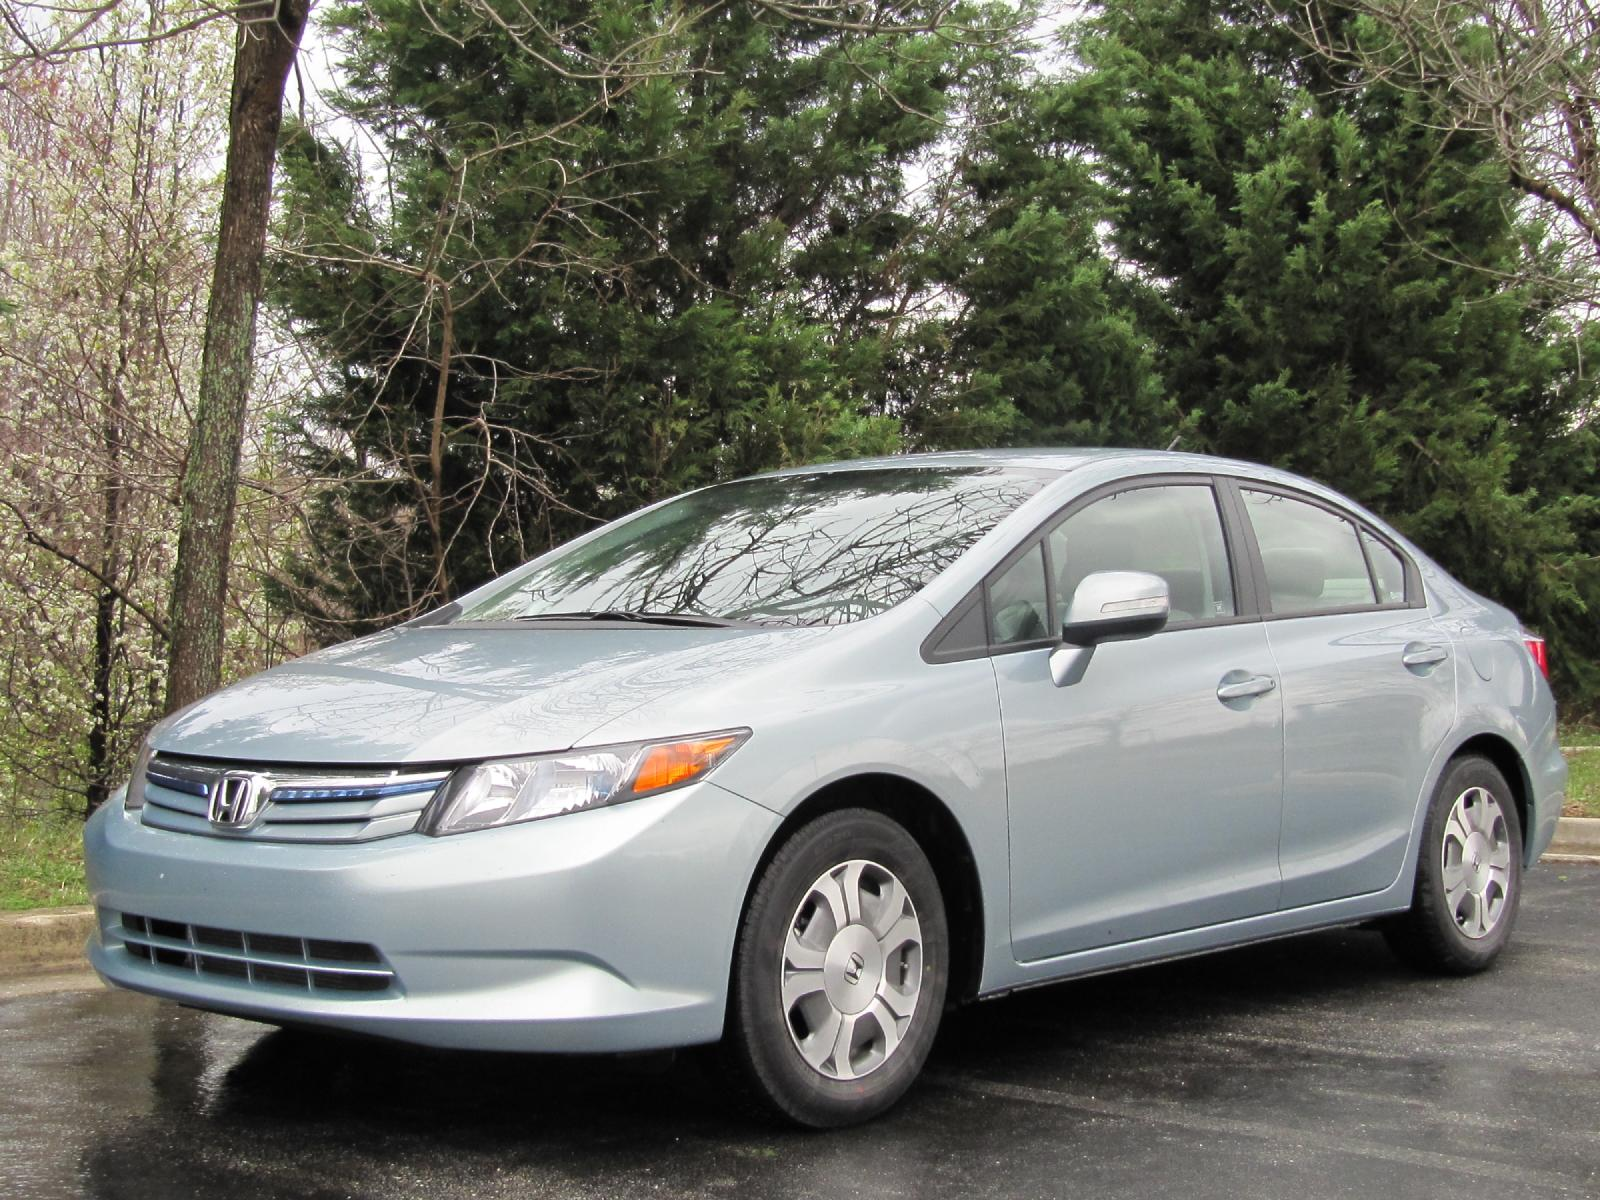 Honda civic hybrid natural gas models eliminated after 2015 for Honda hybrid vehicles